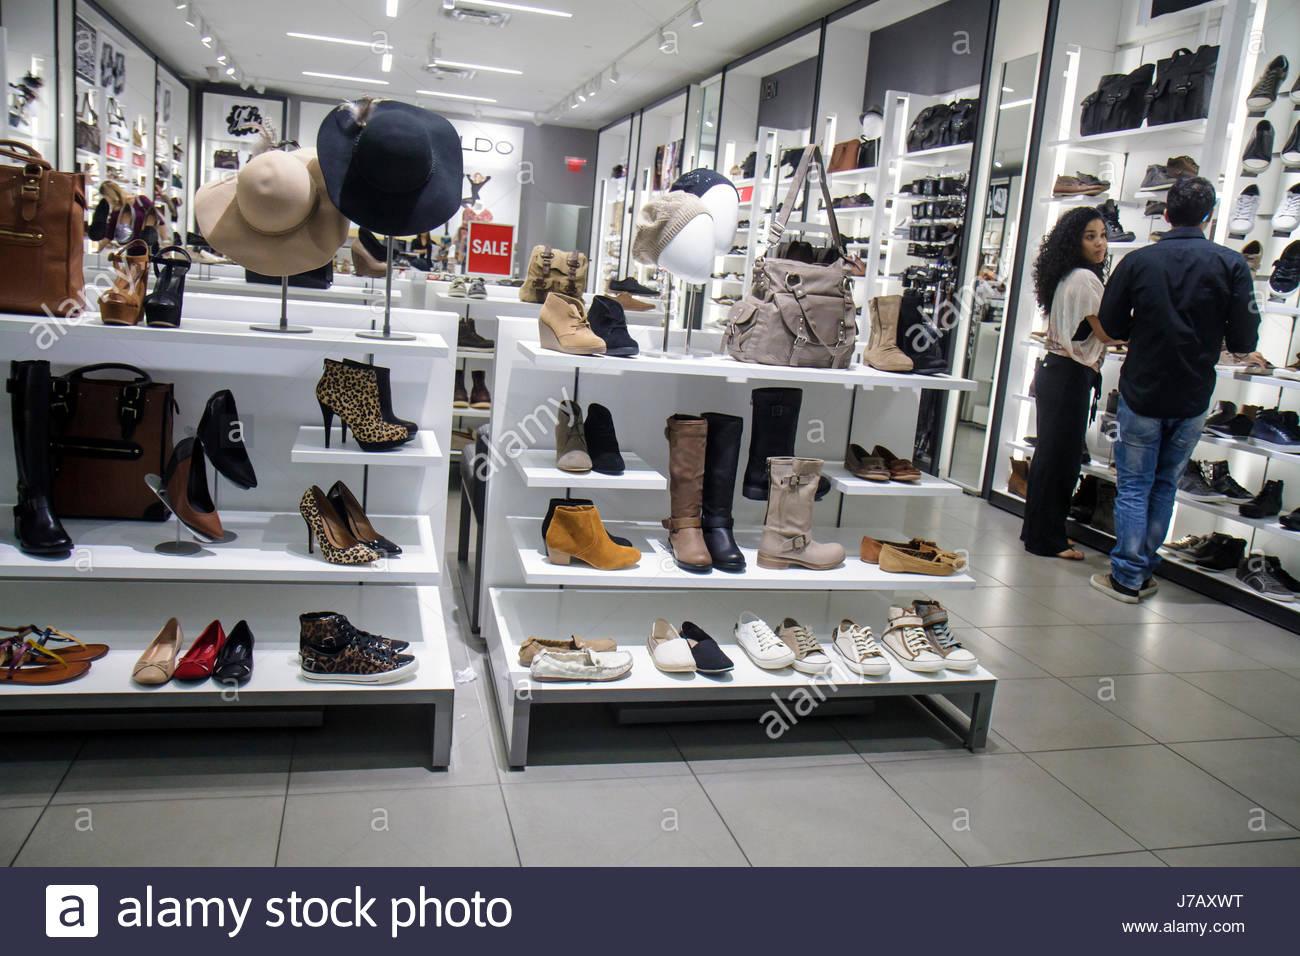 3e7c8632ccaa Miami Florida Dadeland Mall shopping retail display for sale Aldo Shoes  women s handbags hats boots